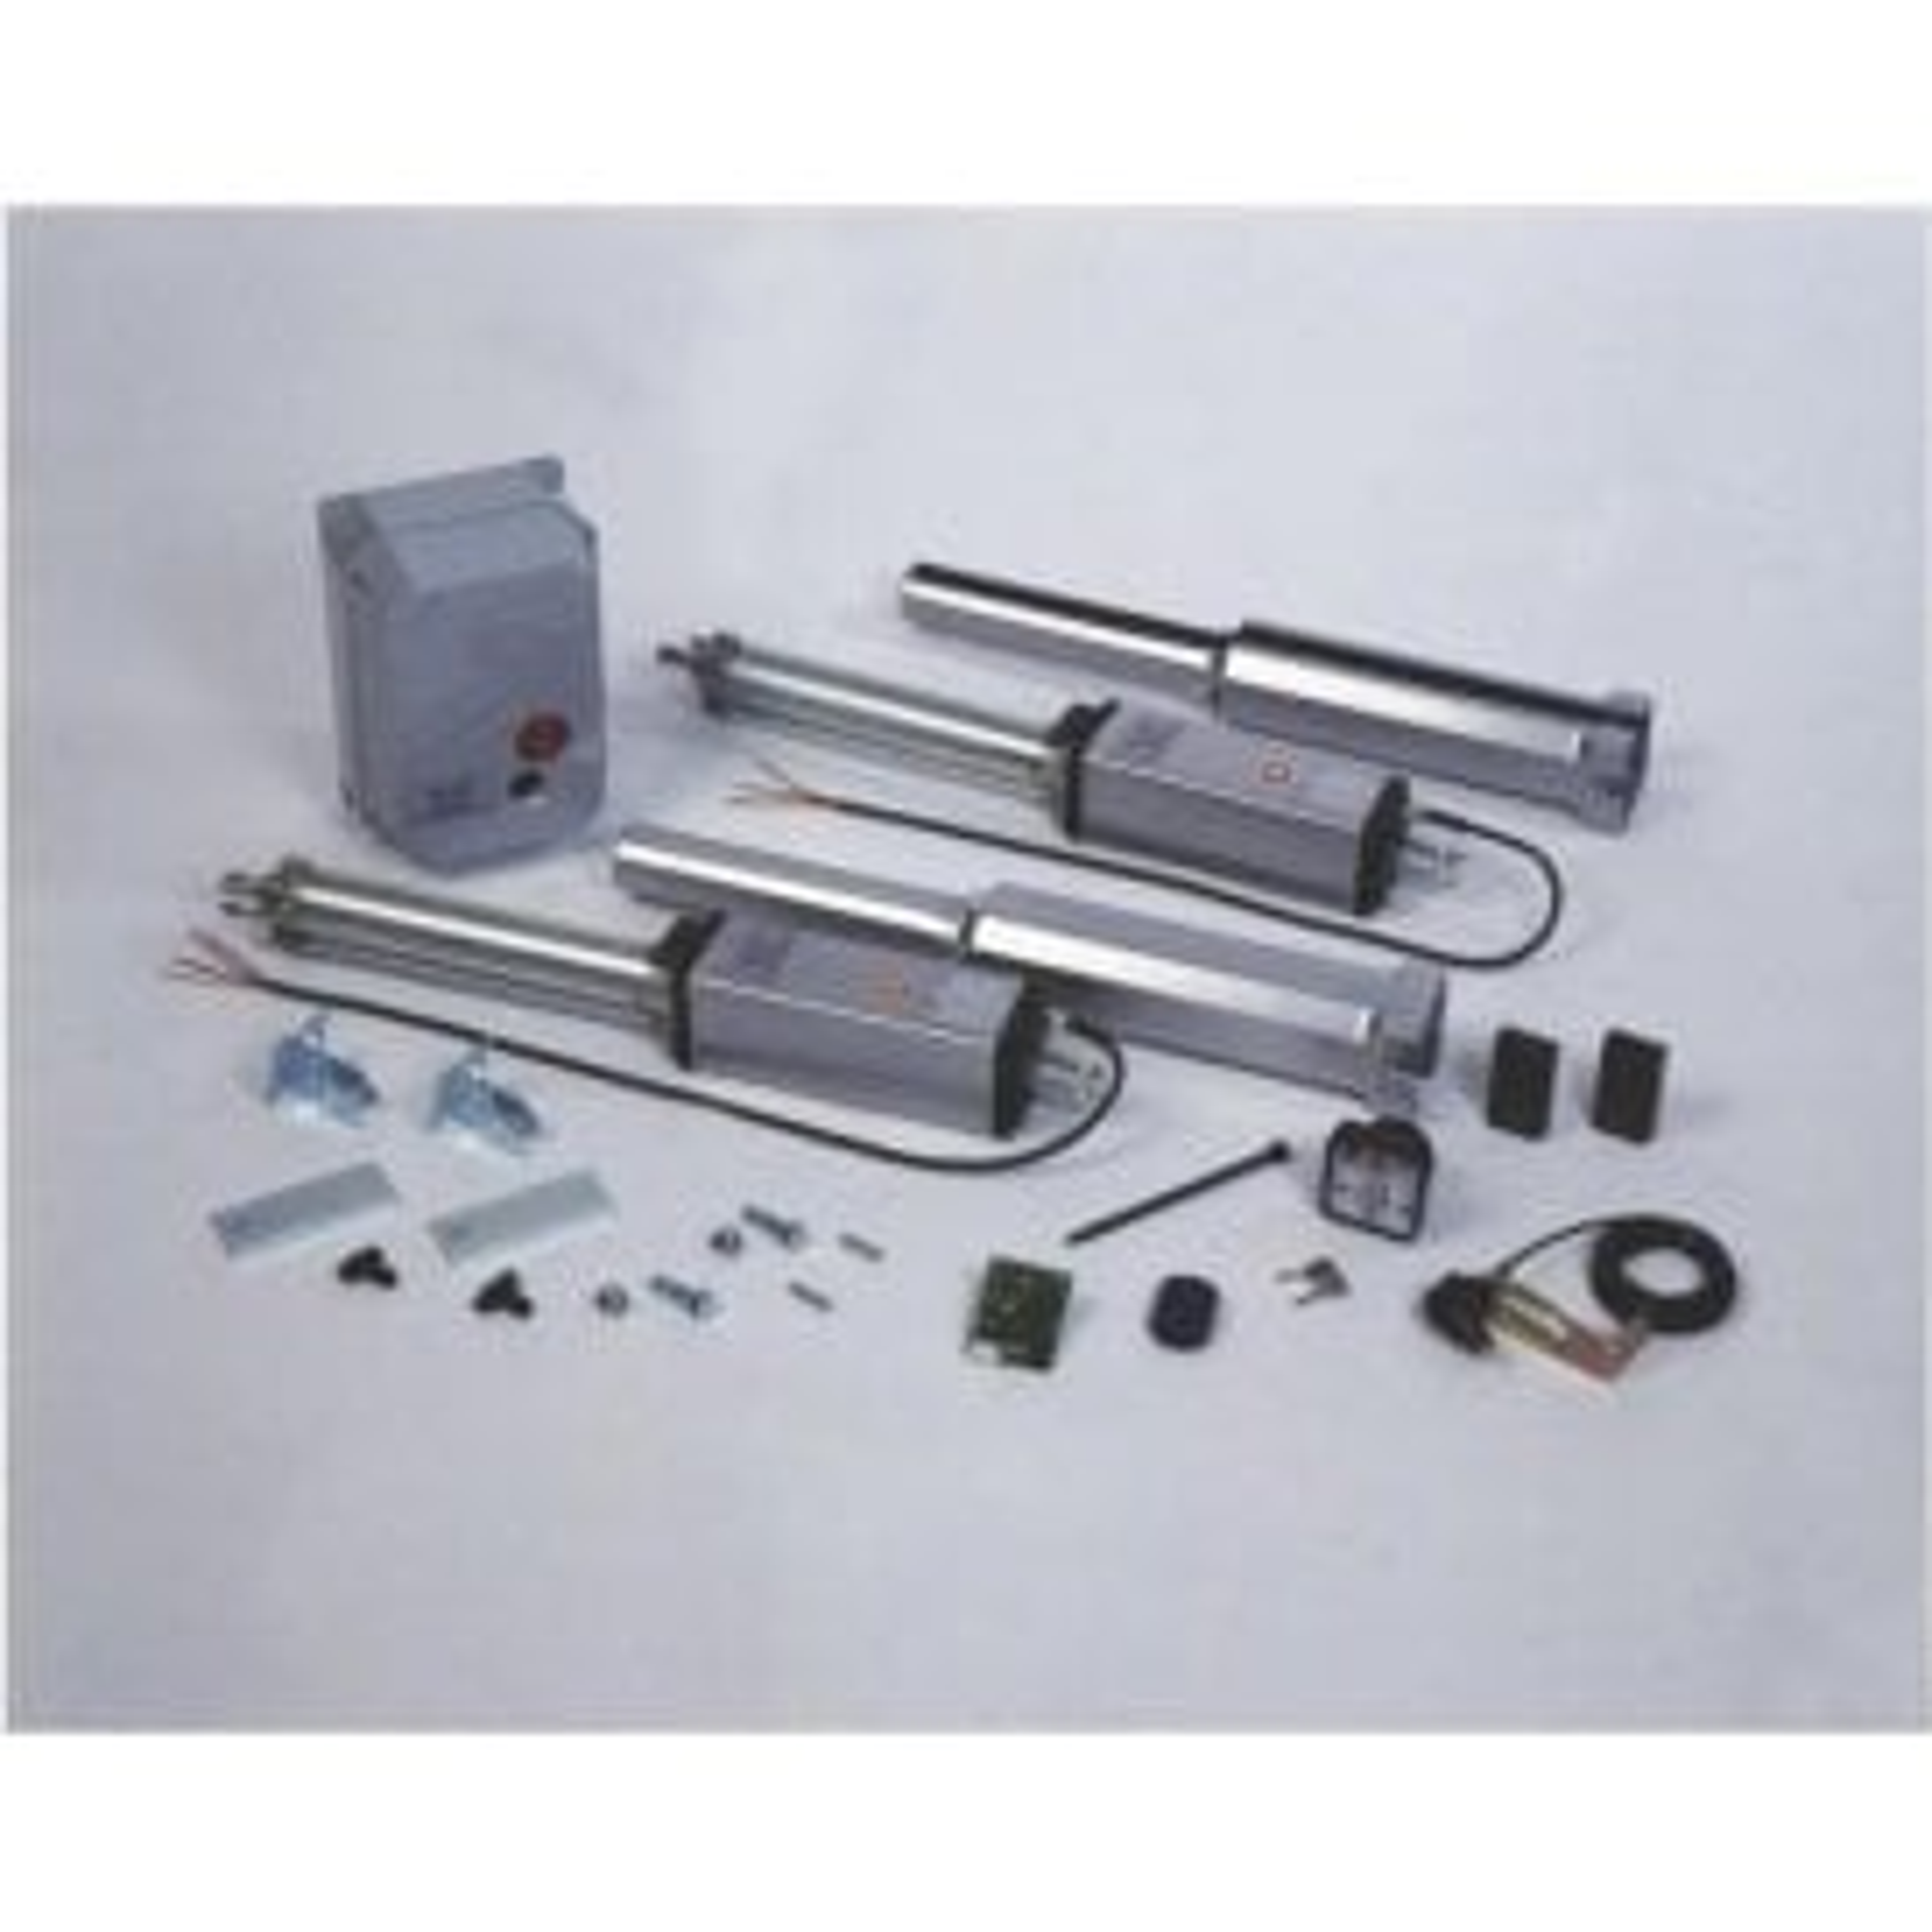 F/202151 HINDI 880 sprint hydraulic operator kit